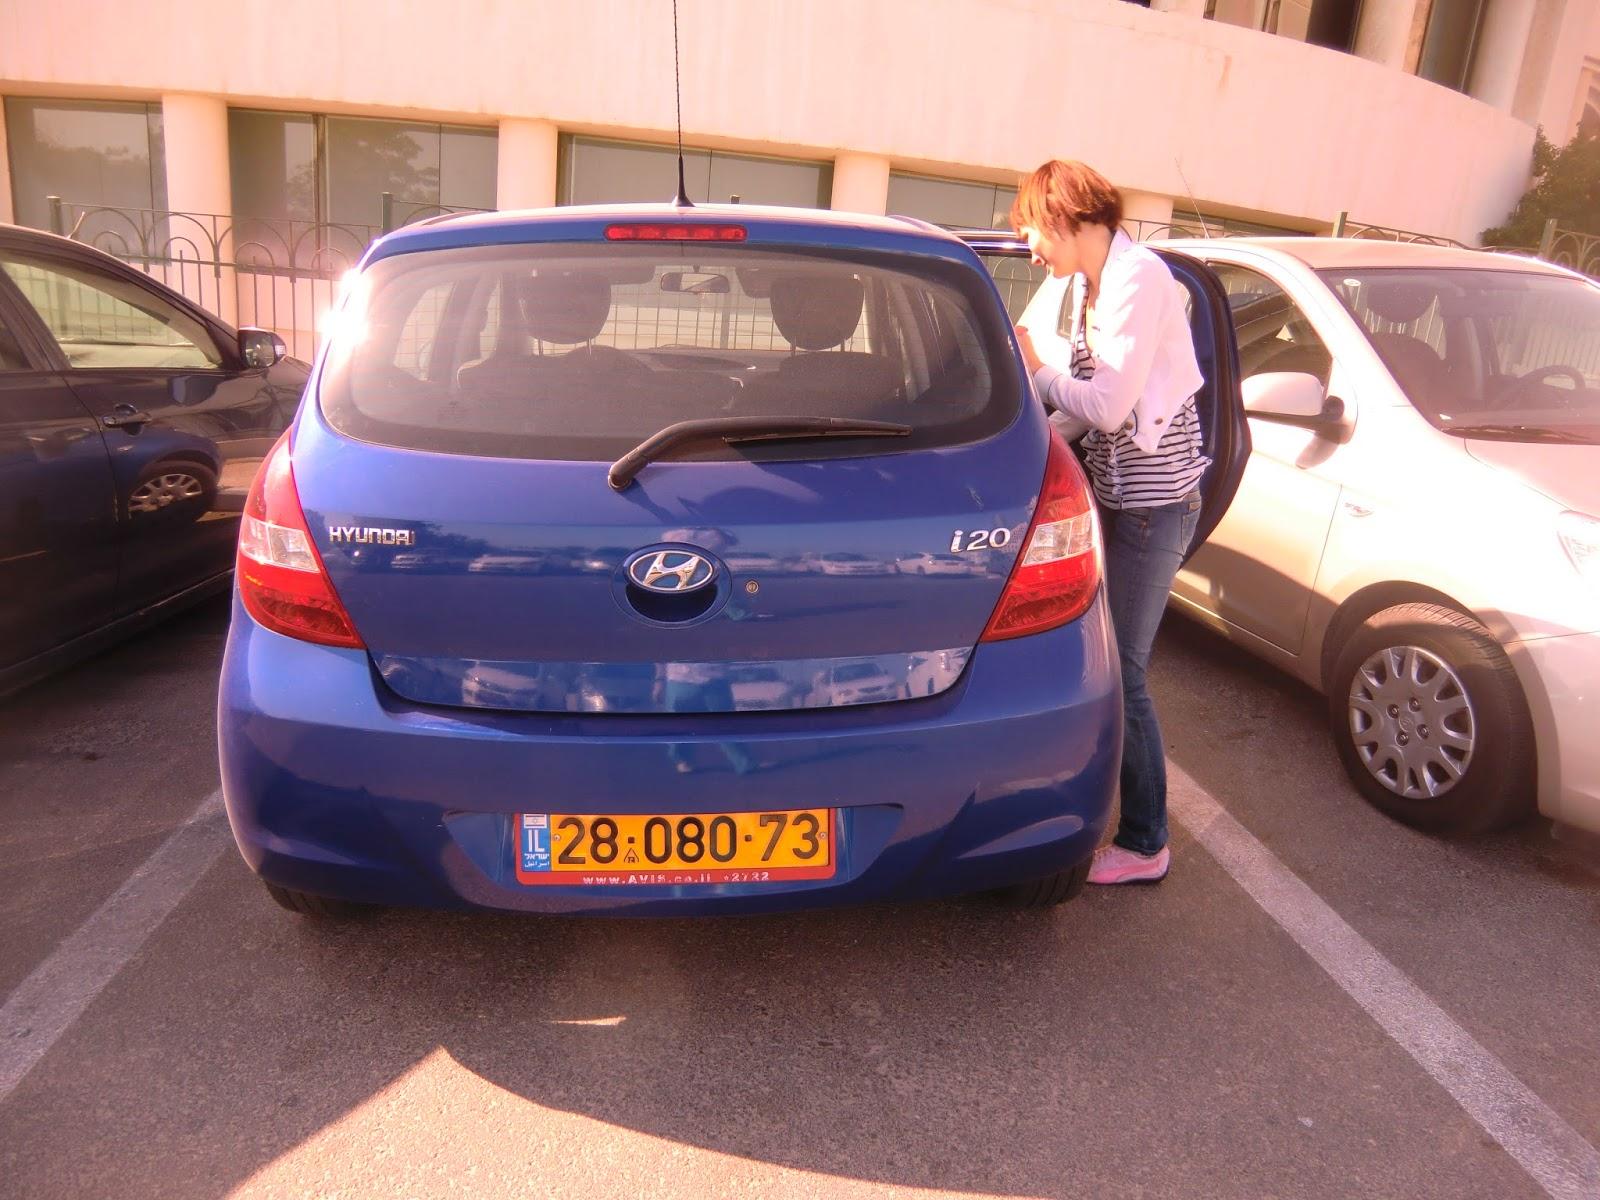 Hyundai-i20-Israel